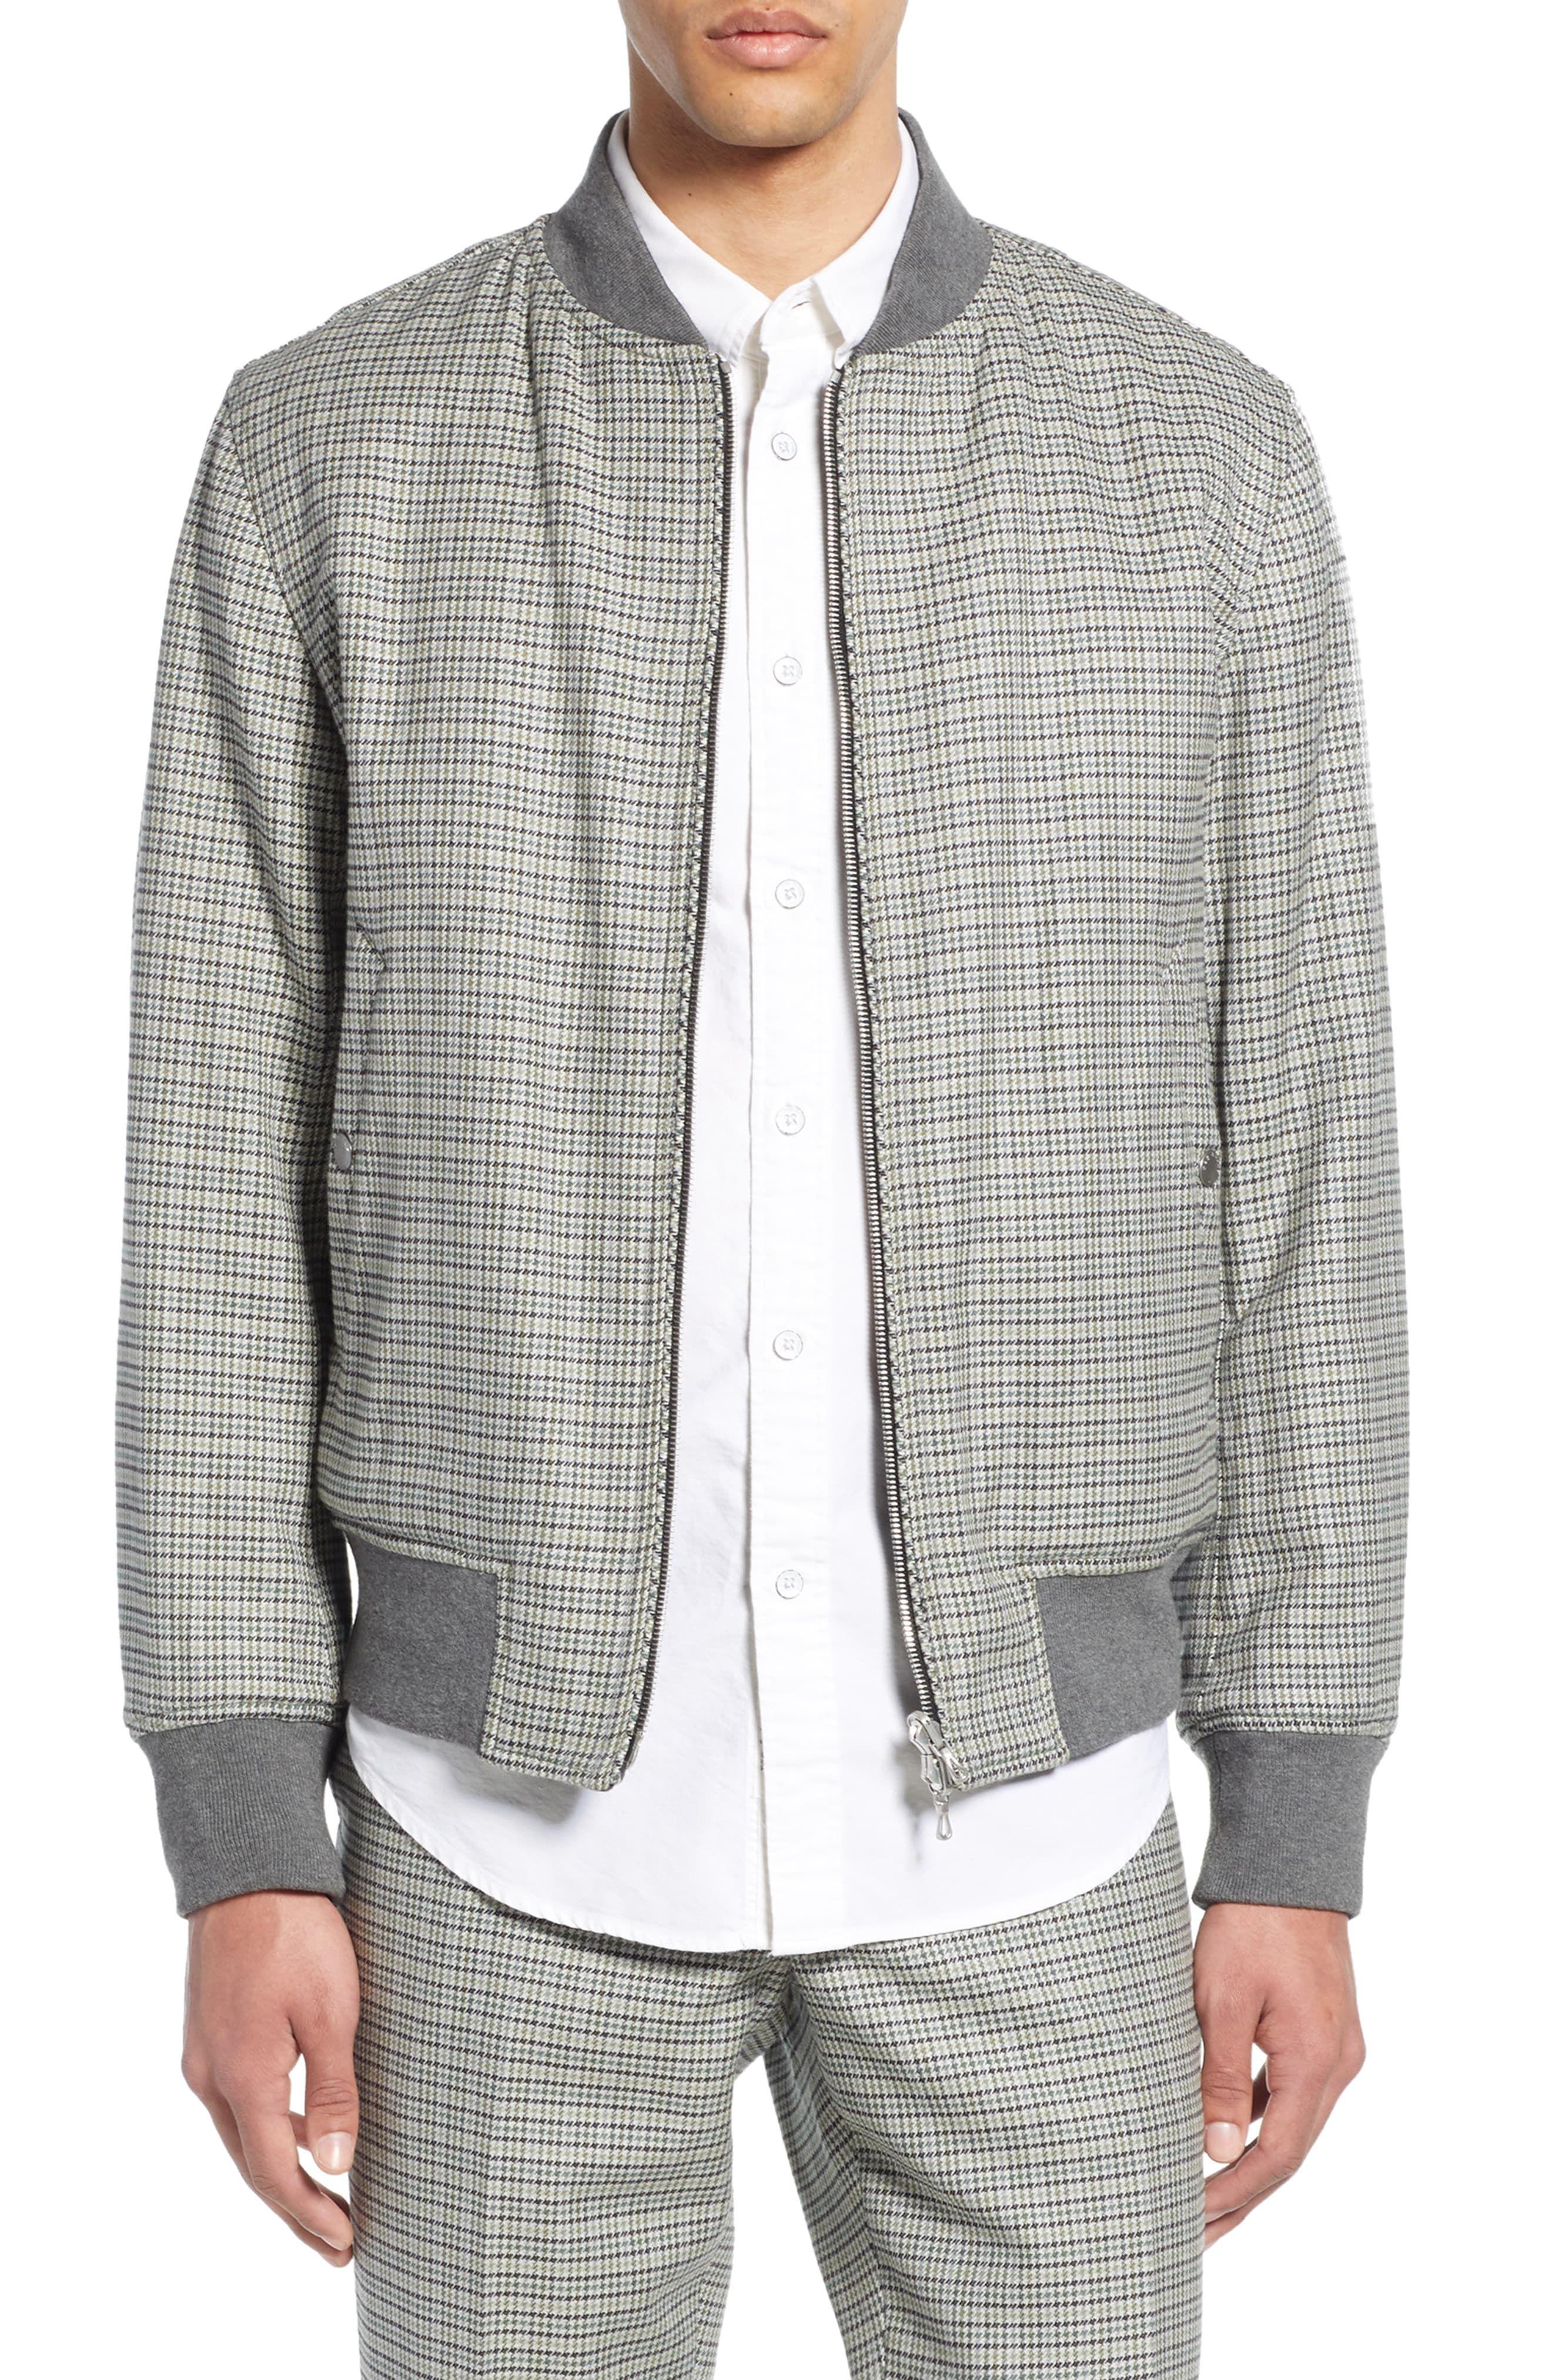 fce4e4aef Men's Rag & Bone Manston Reversible Cotton & Wool Bomber Jacket ...